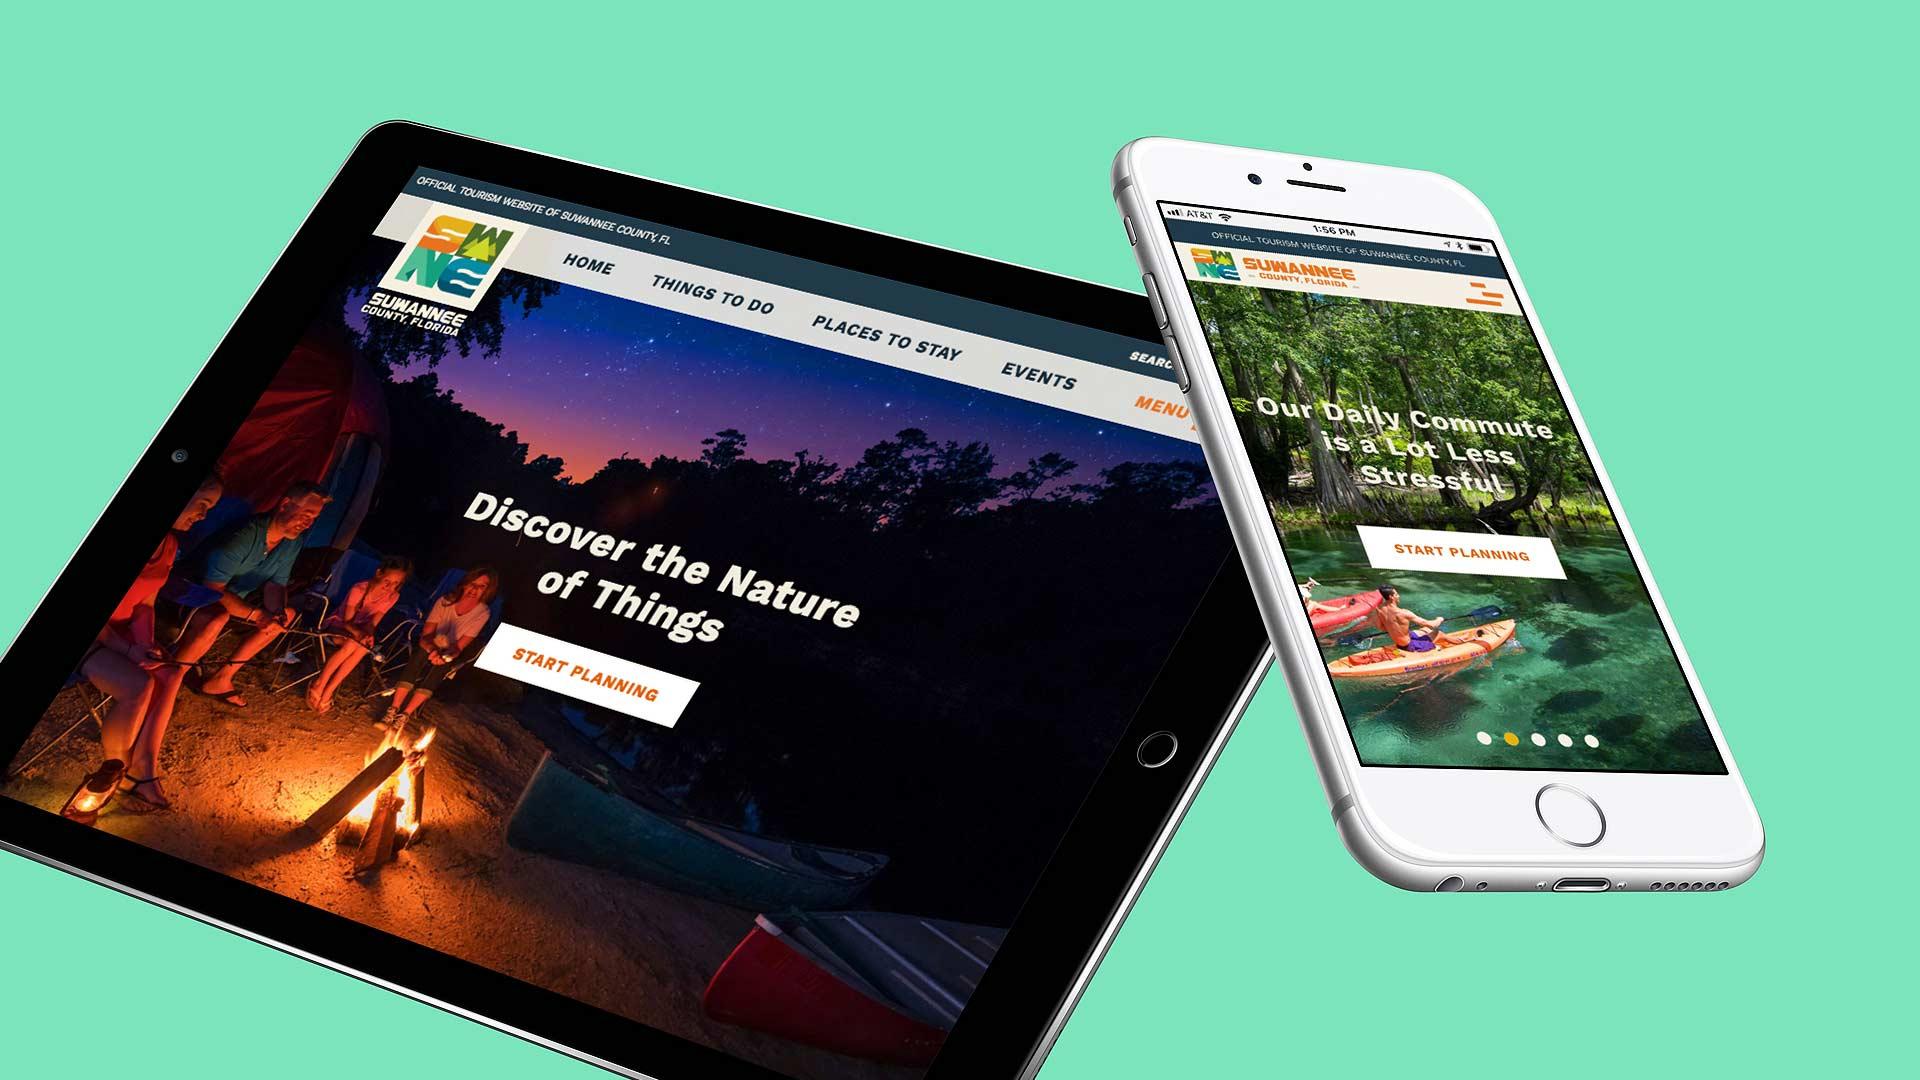 iPhone and iPad displaying Suwannee County website